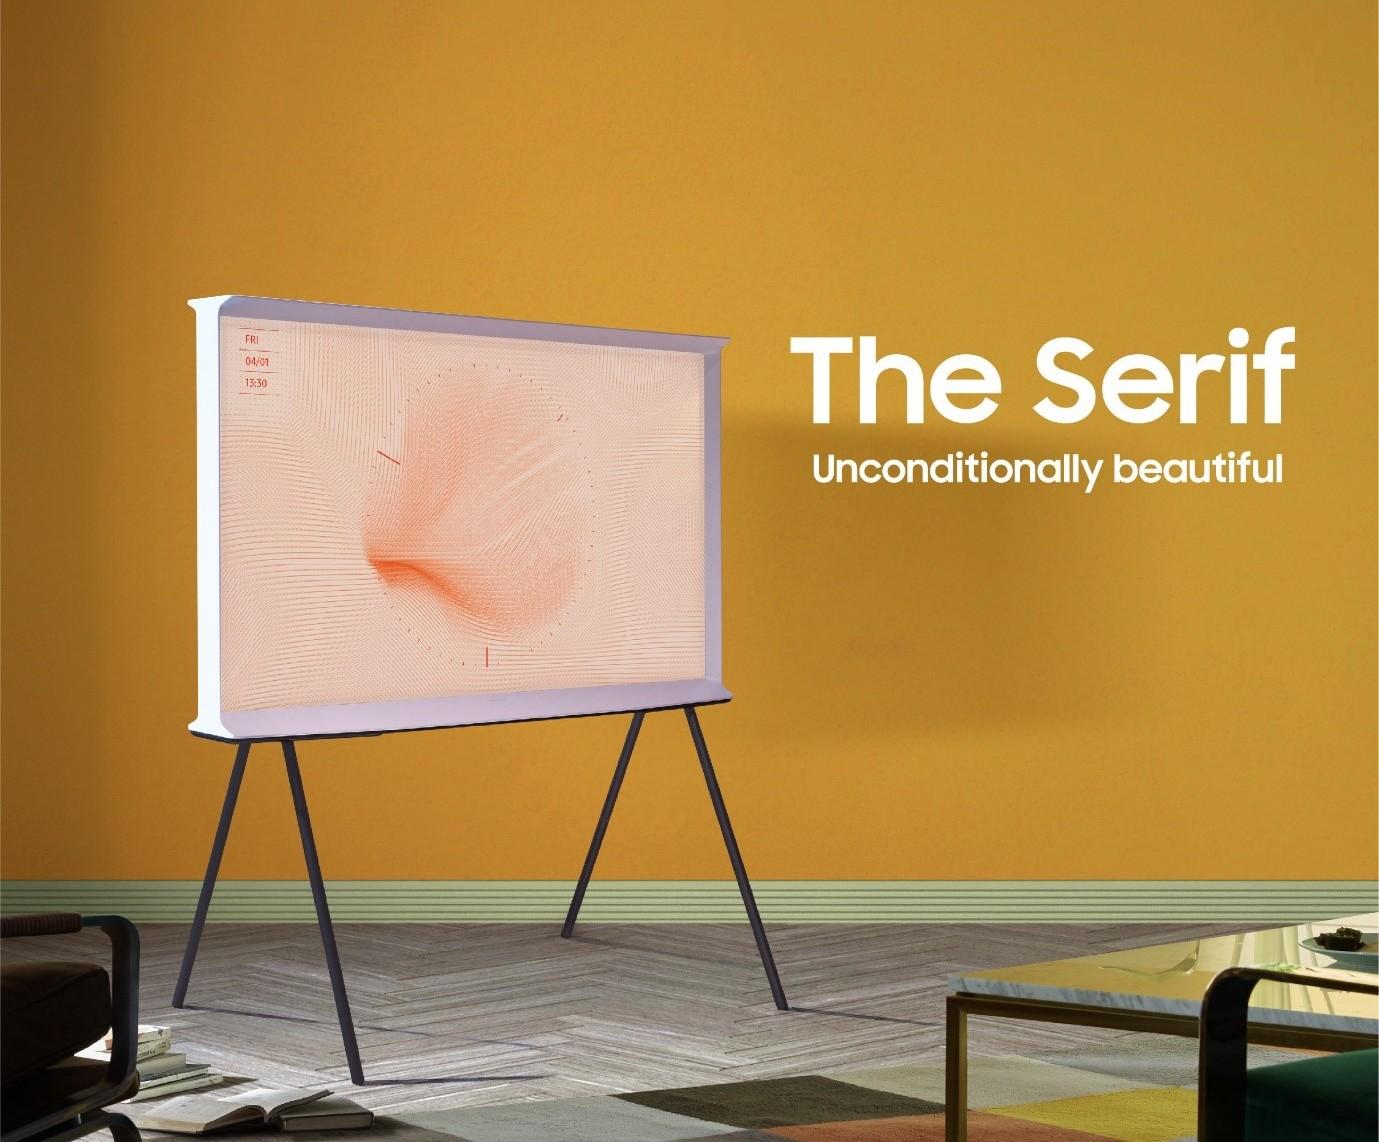 The Serif TV